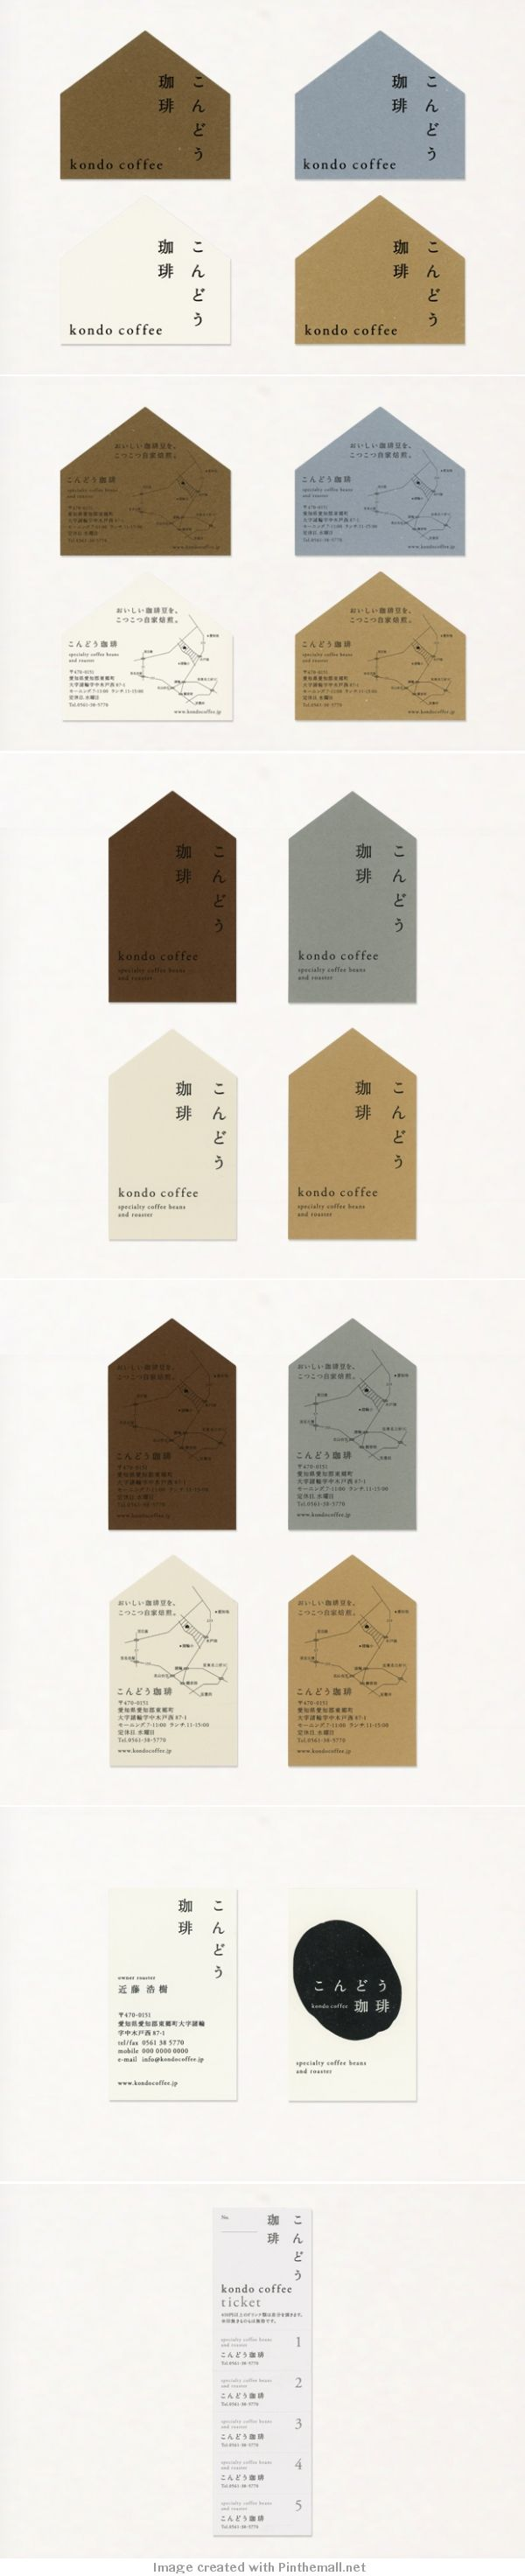 kondo coffee|http://www.fujimoto-gumi.com/blog